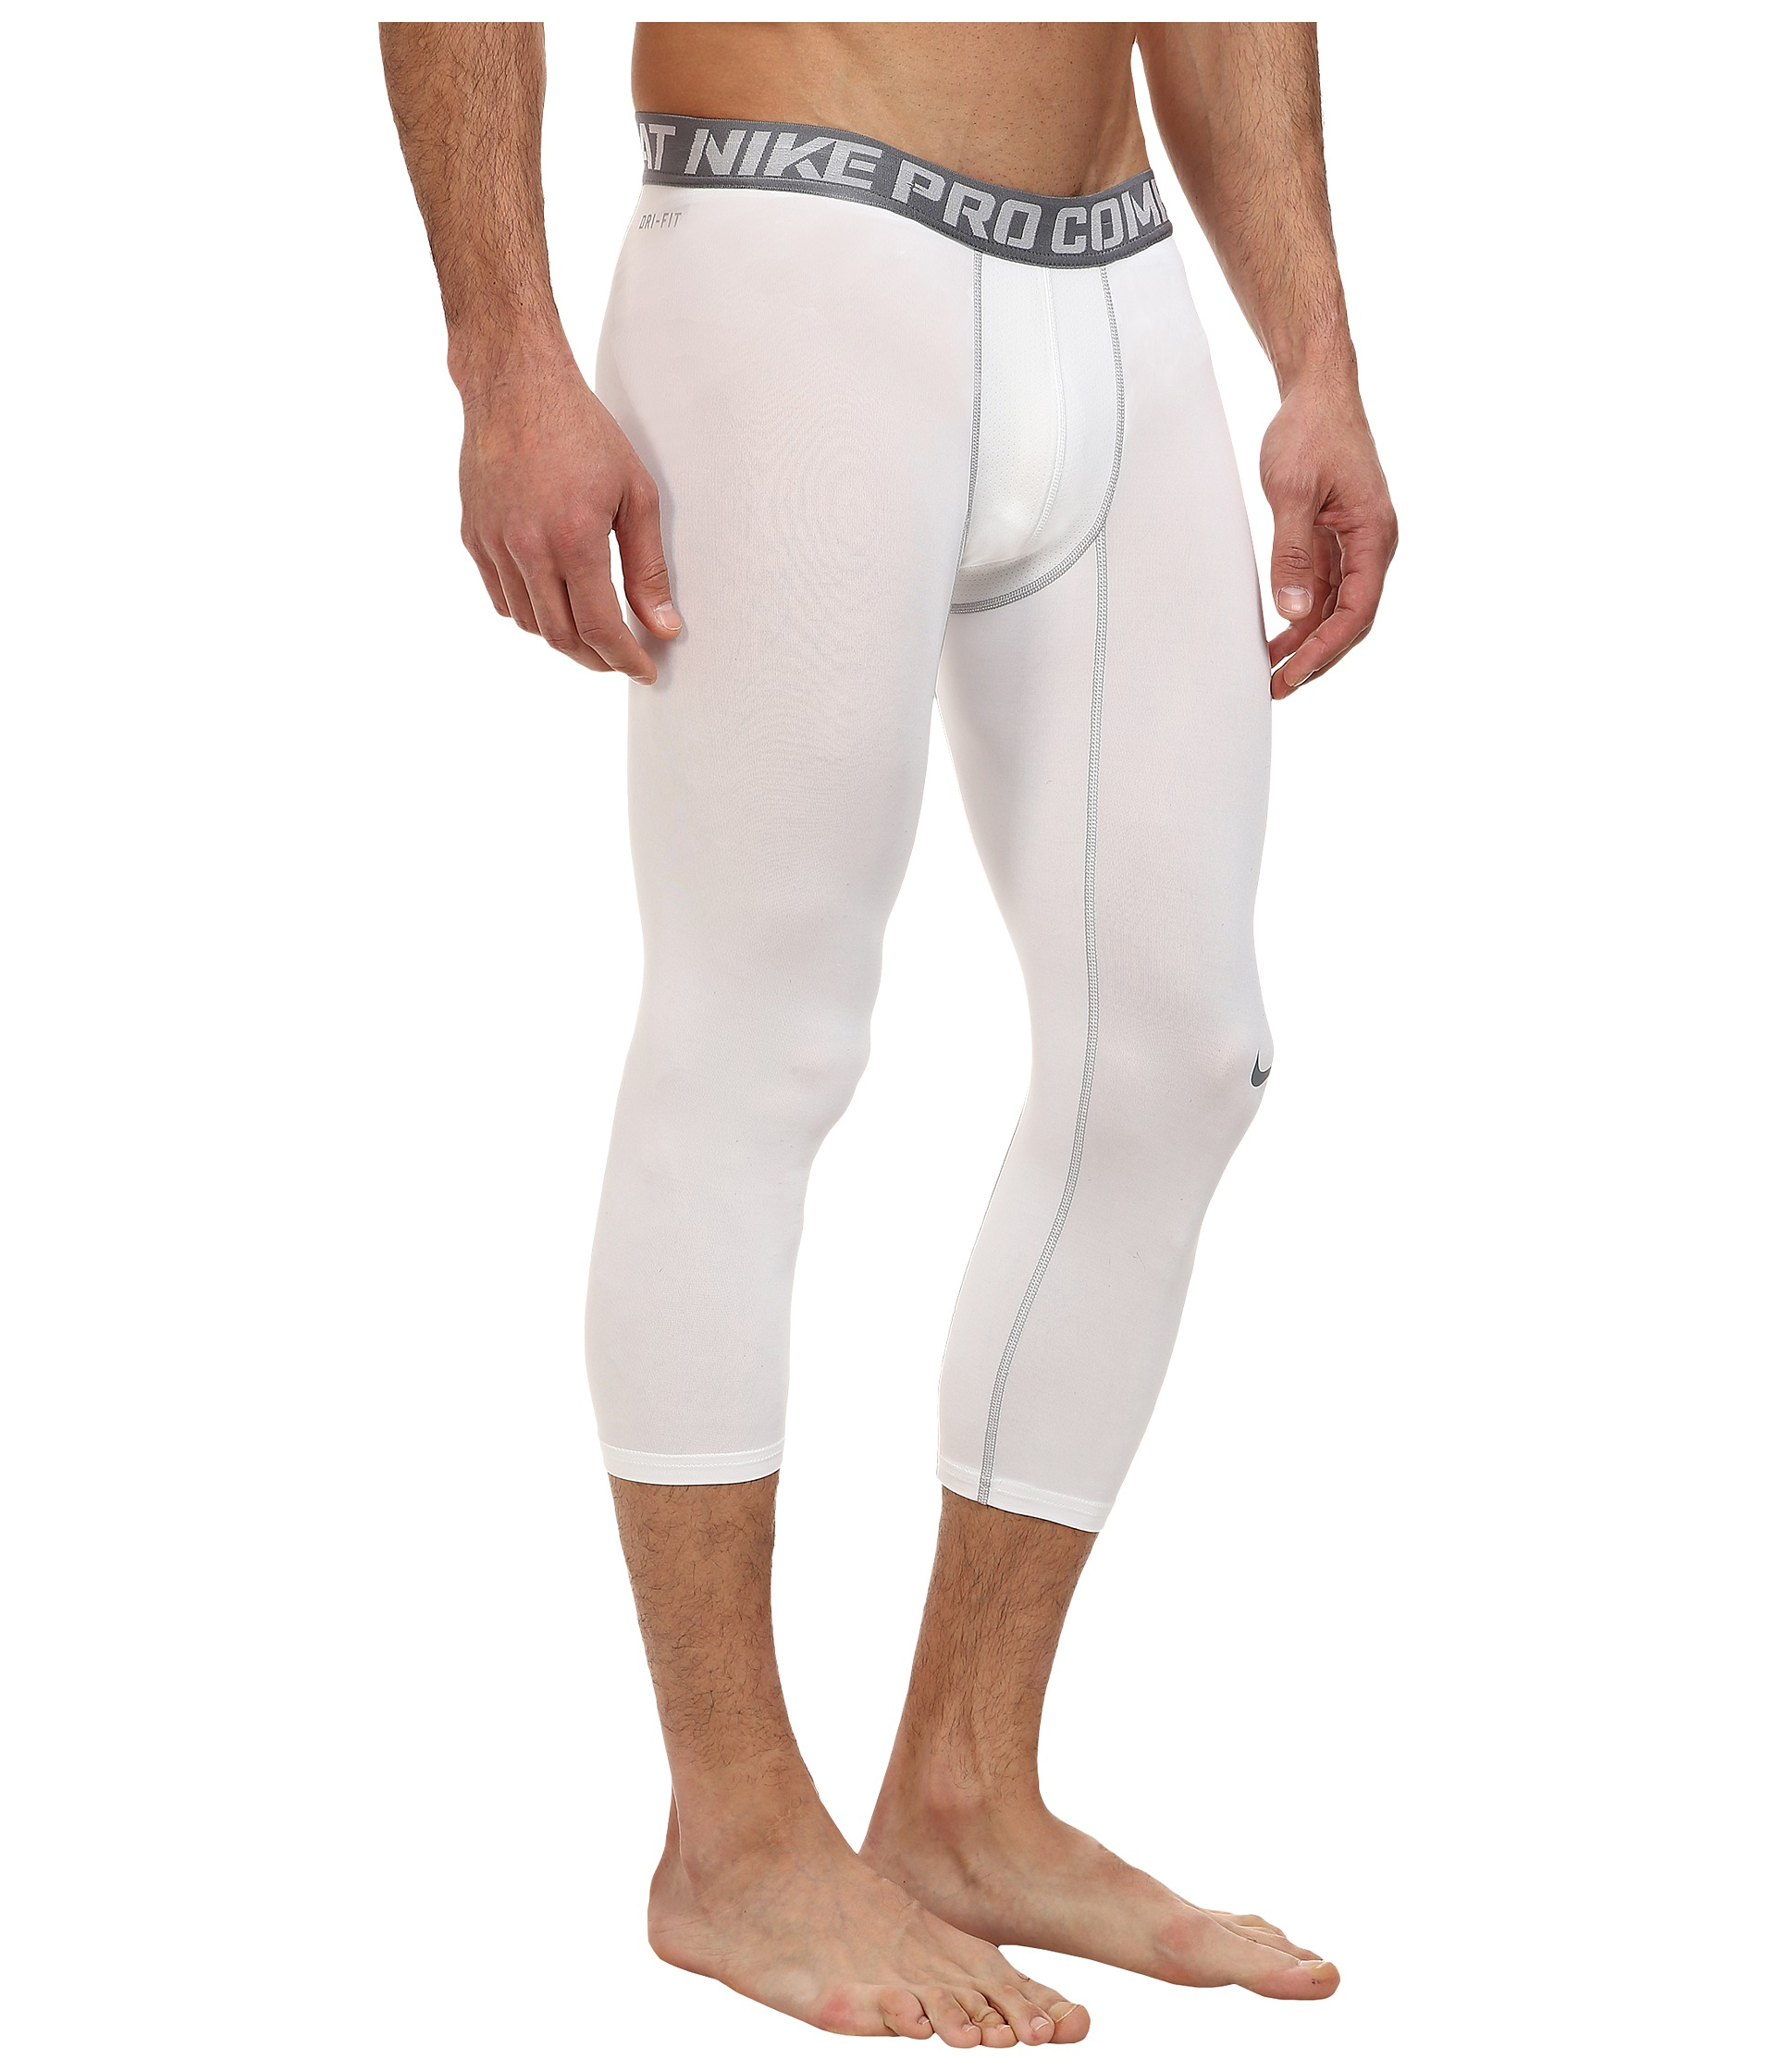 nike men's 9 core compression shorts